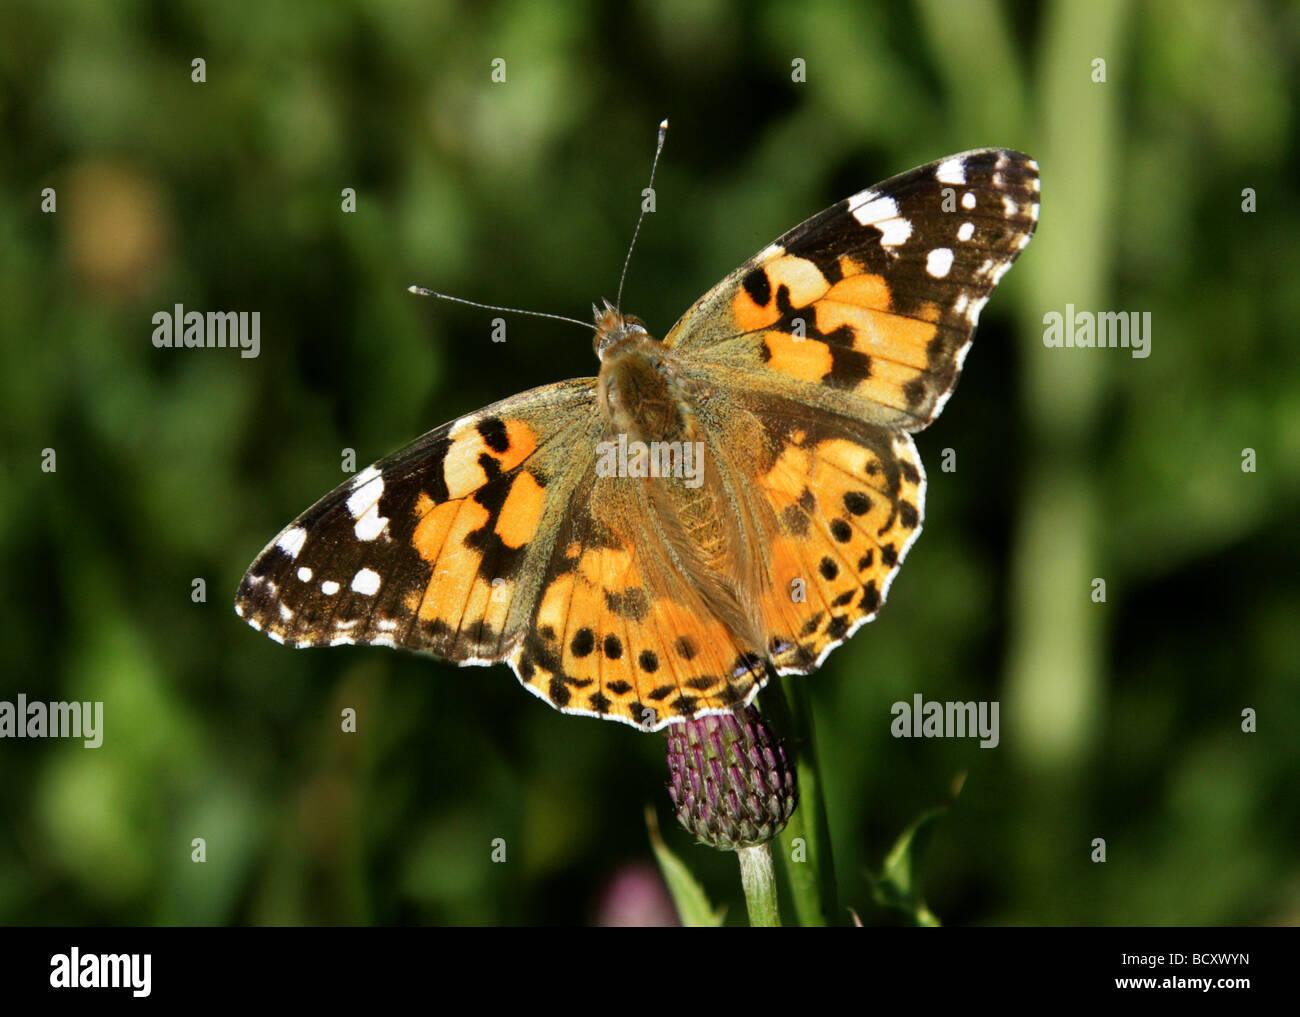 Painted Lady Butterfly, Vanessa cardui, Nymphalidae, Lepidoptera. Feeding on Sawwort, Serratula tinctoria, Asteraceae - Stock Image